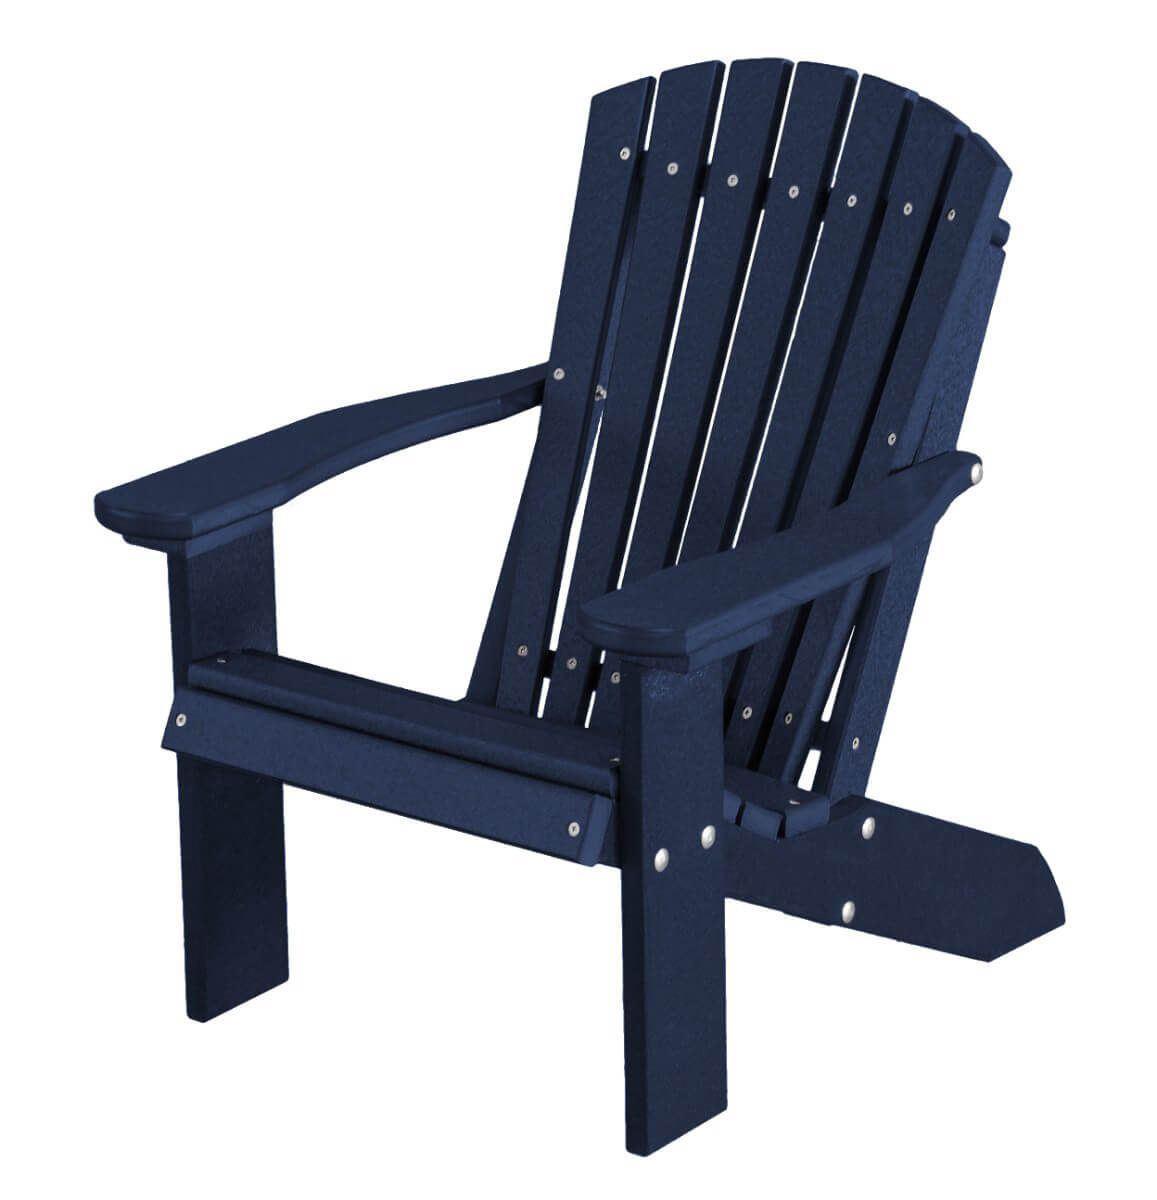 Patriot Blue Sidra Child's Adirondack Chair